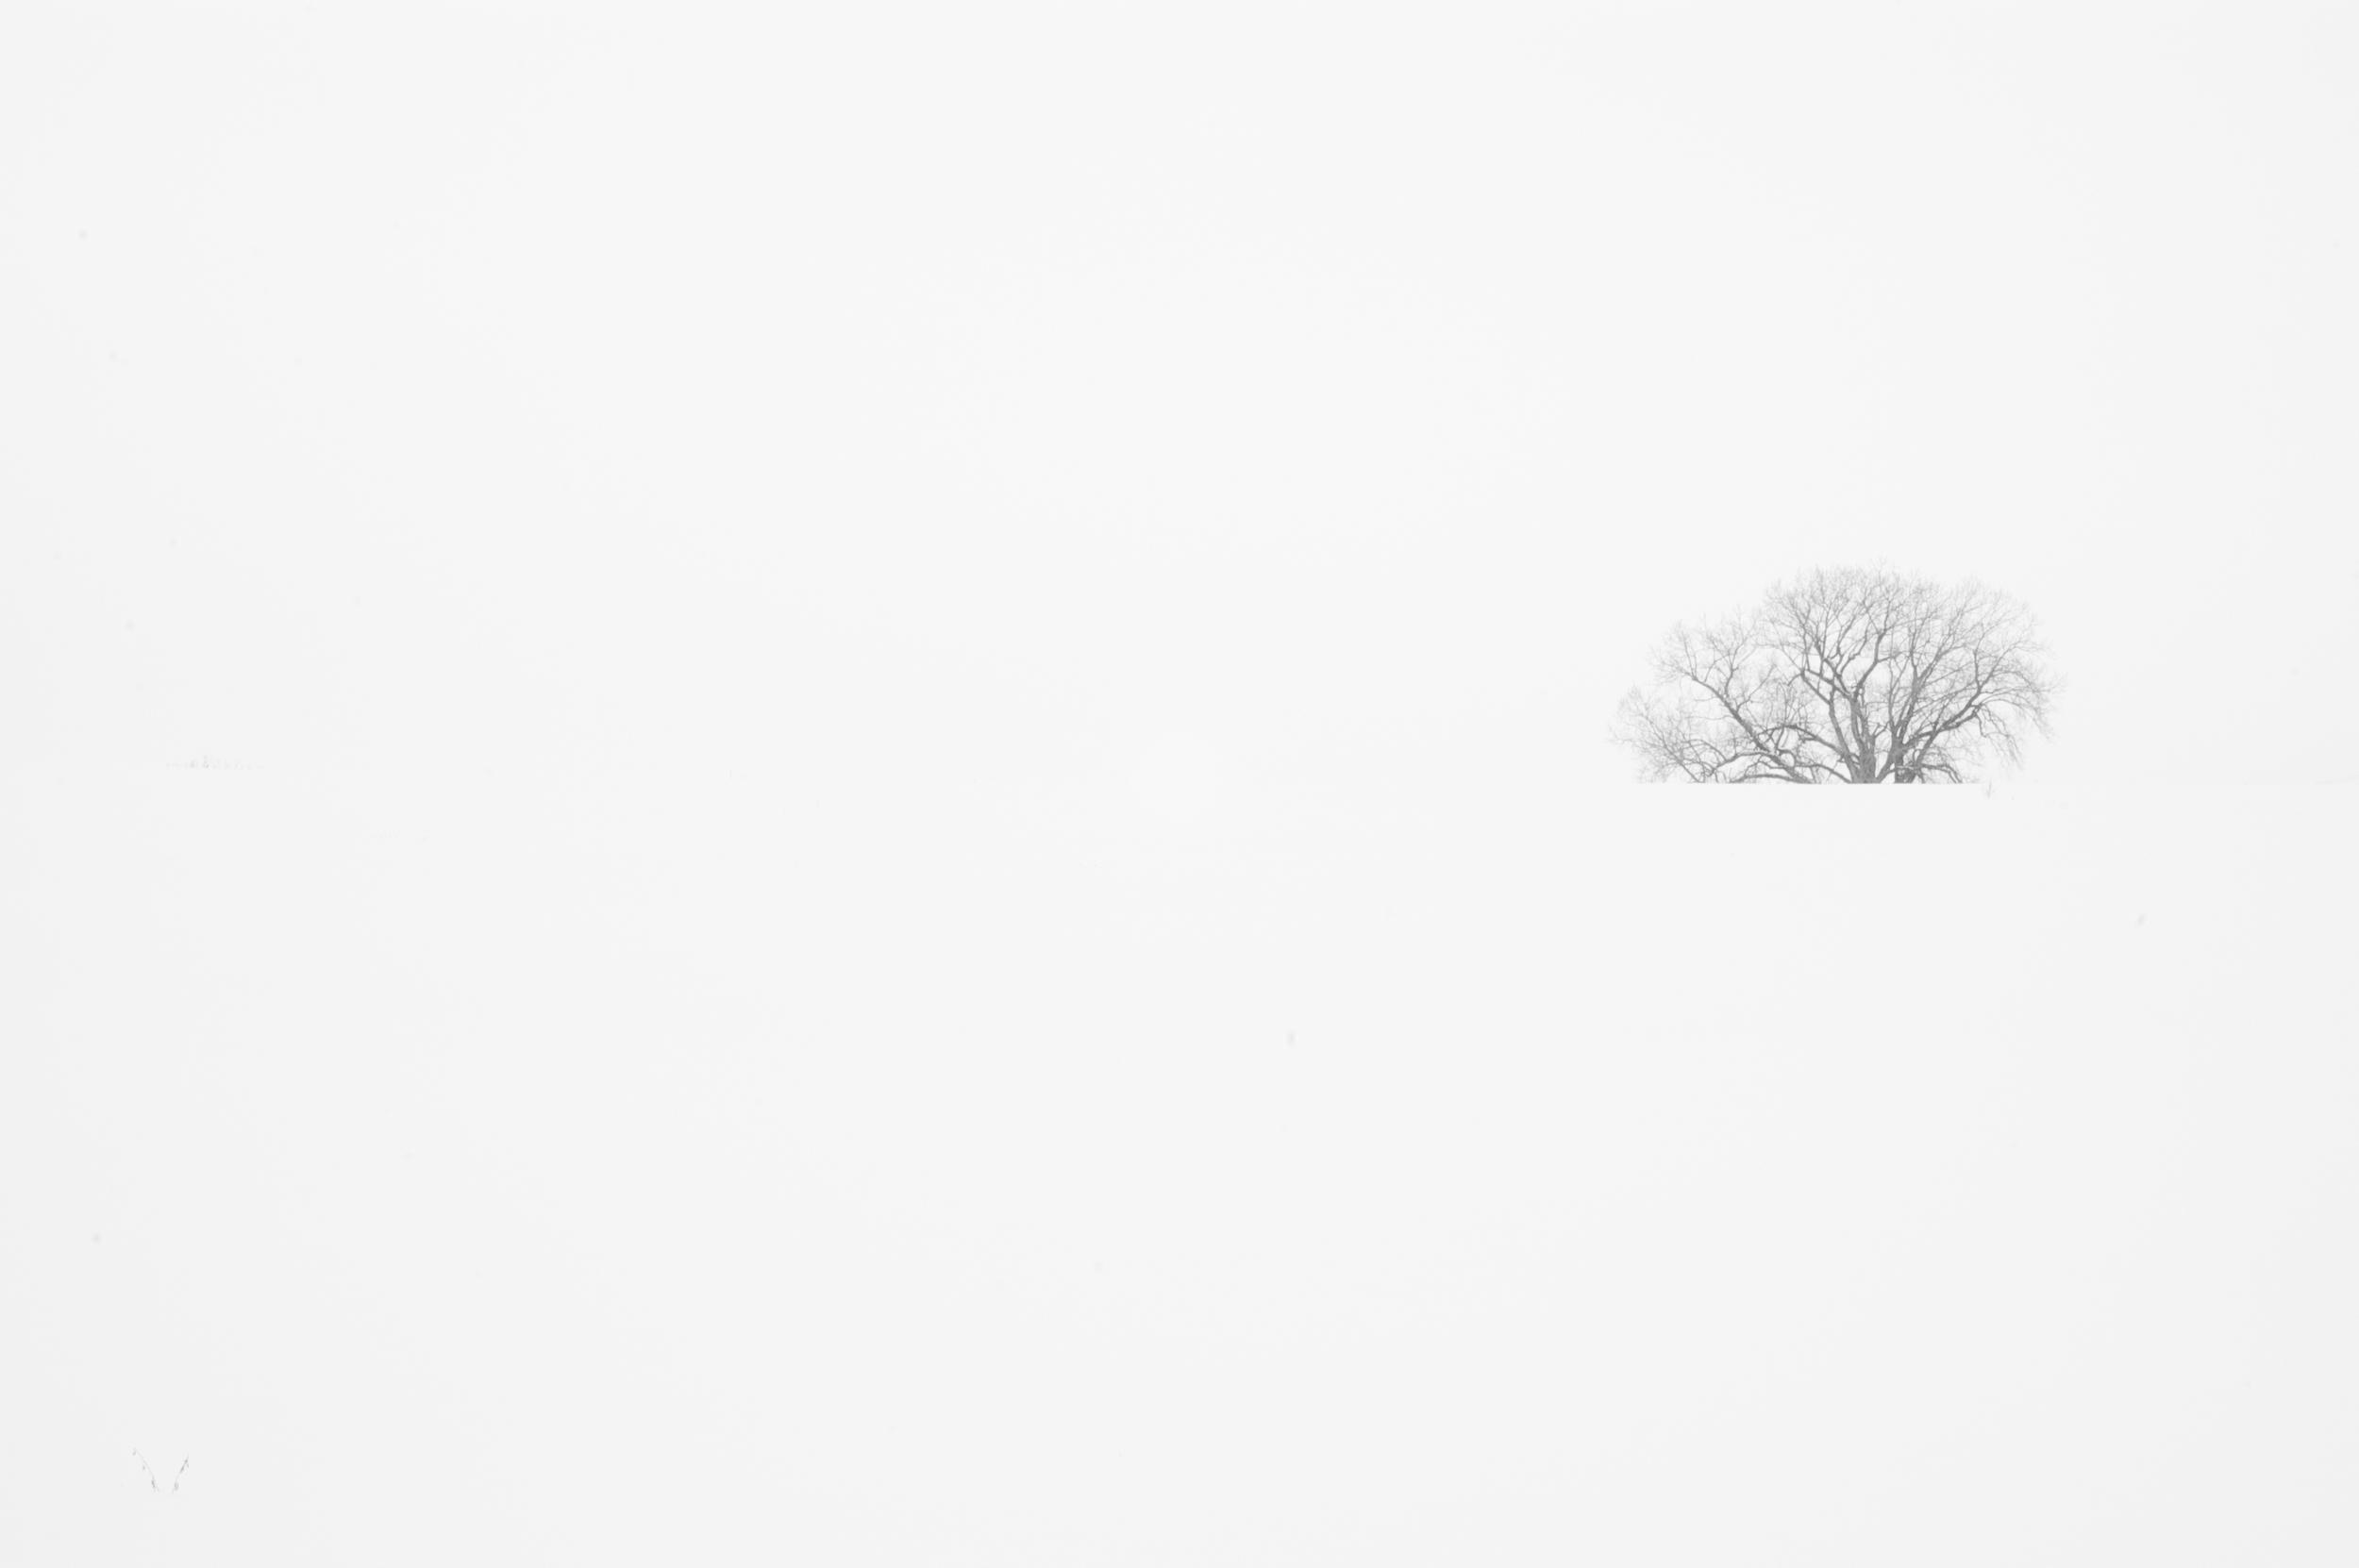 Tree in a Snow Field. Bethel Horizons.Dodgeville, Wisconsin. February 2010. © William D. Walker.